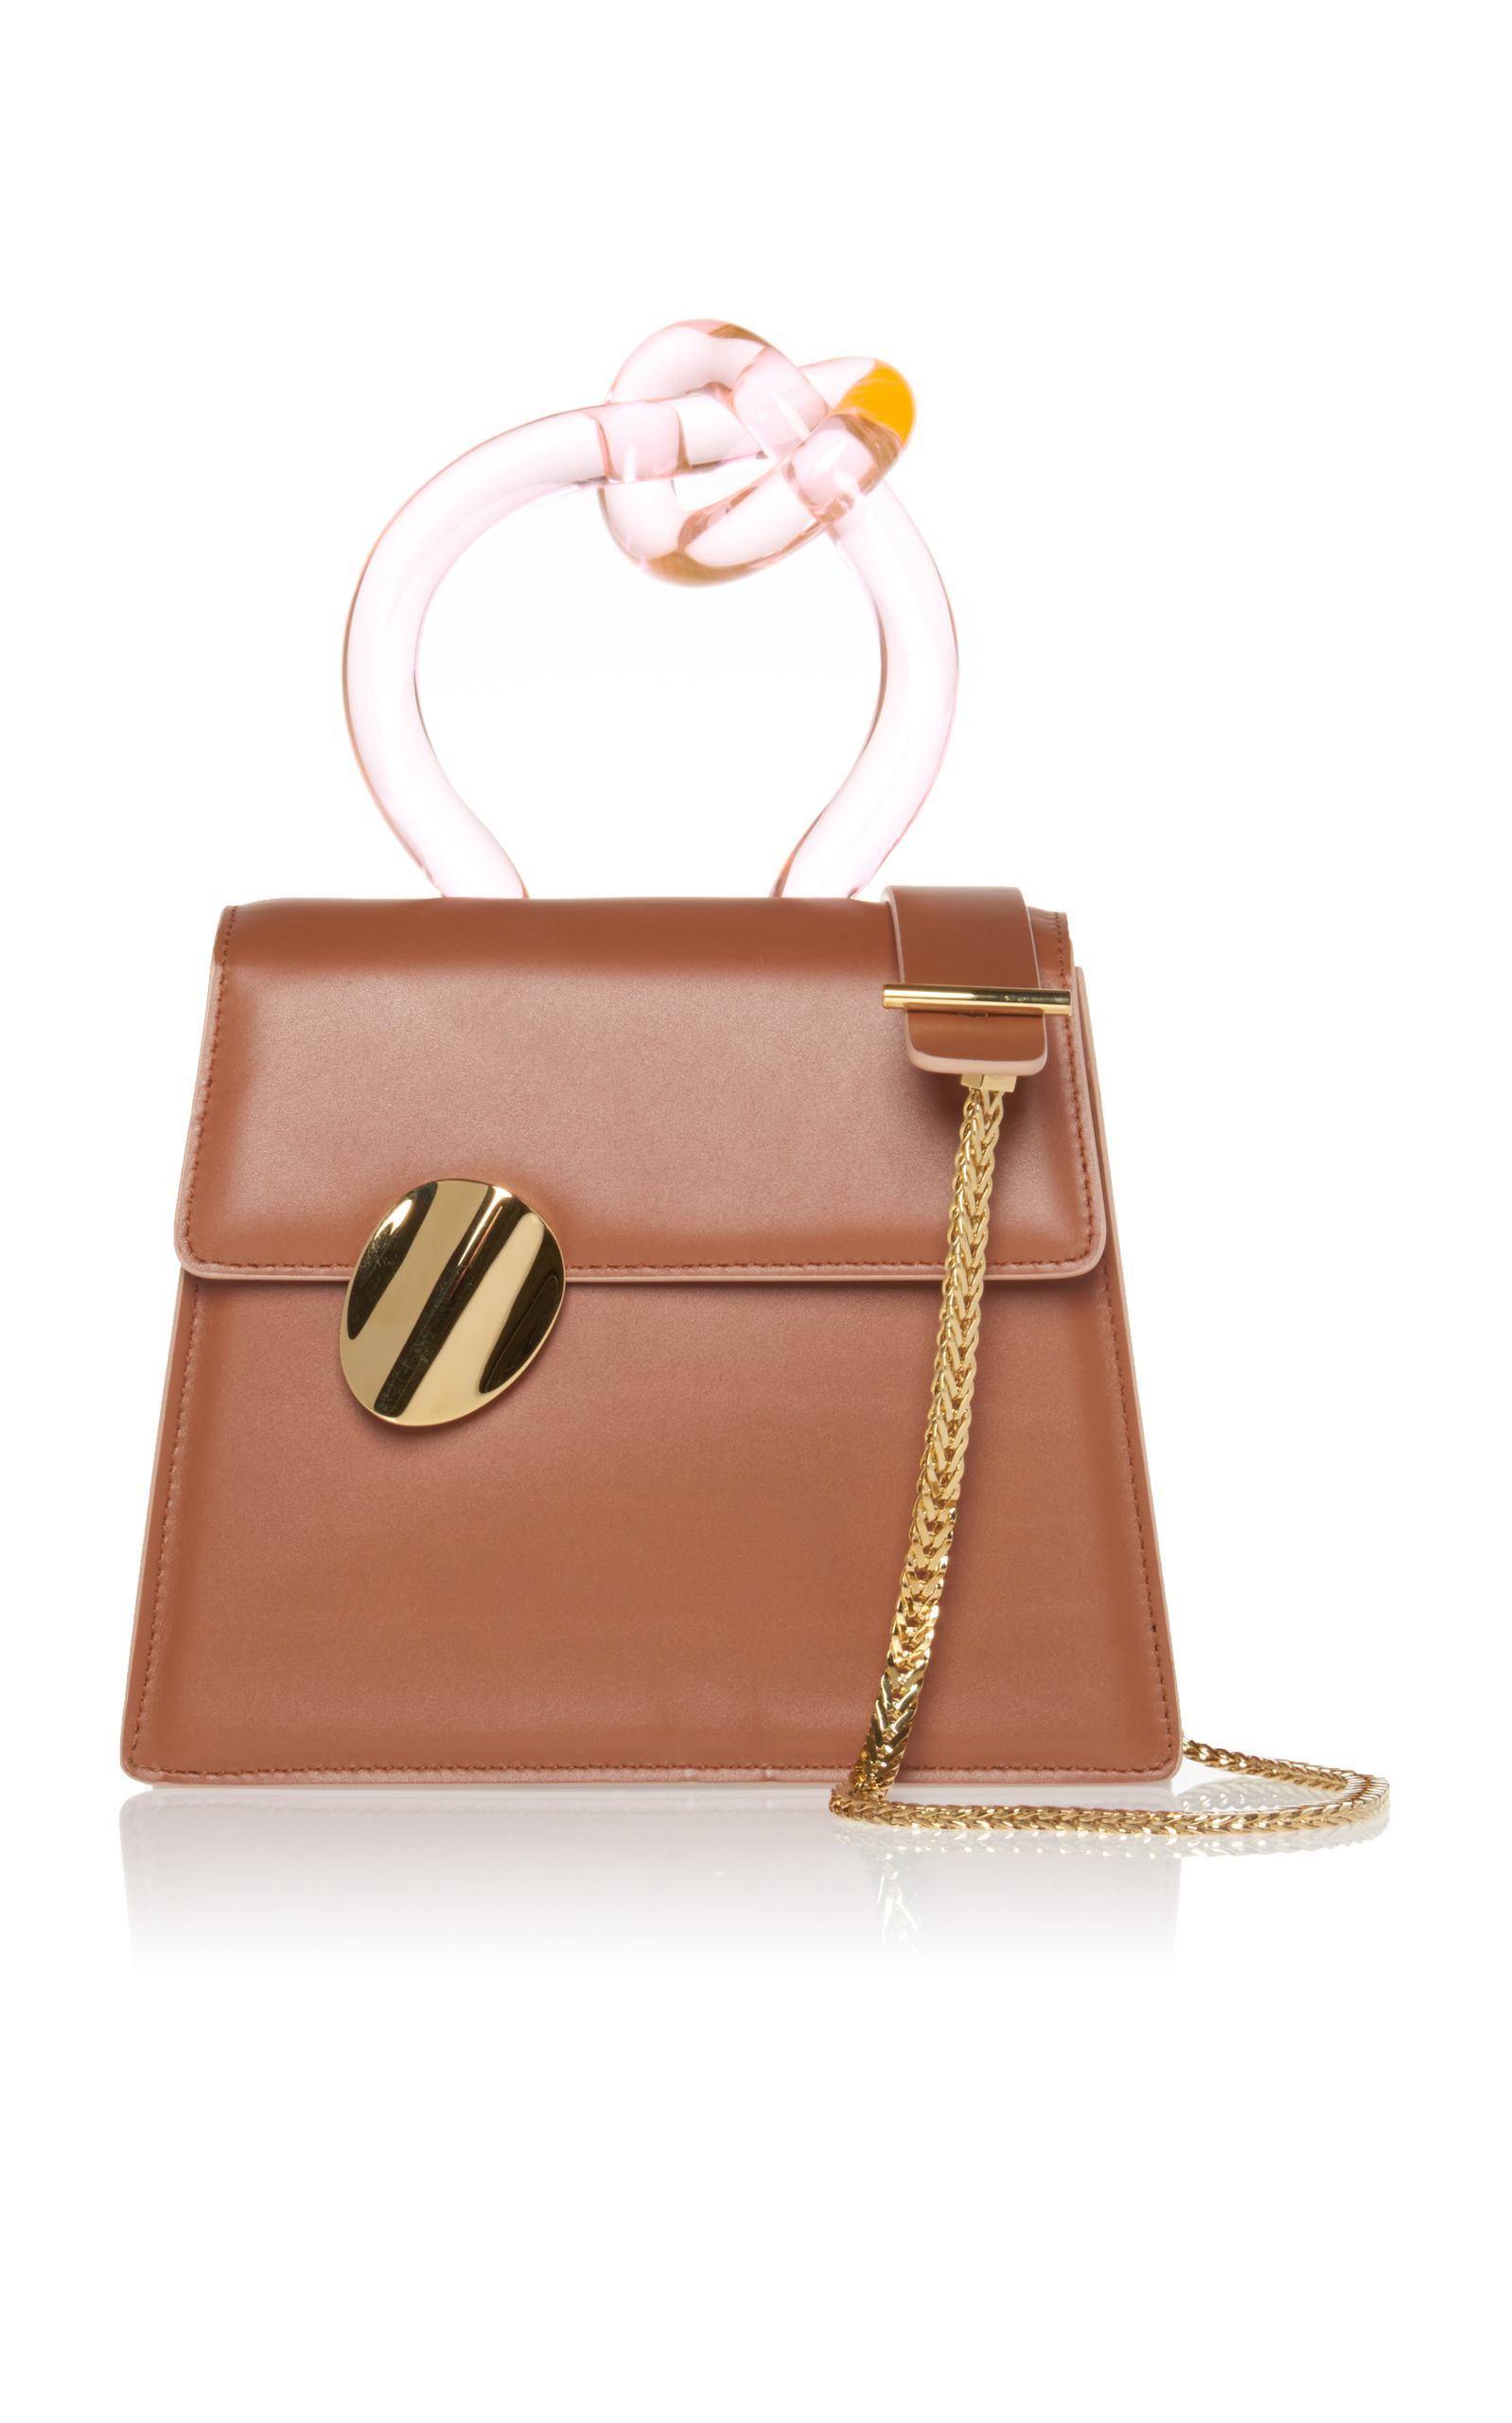 Benedetta Bruzziches Brigitta Top Handle Bag In Brown